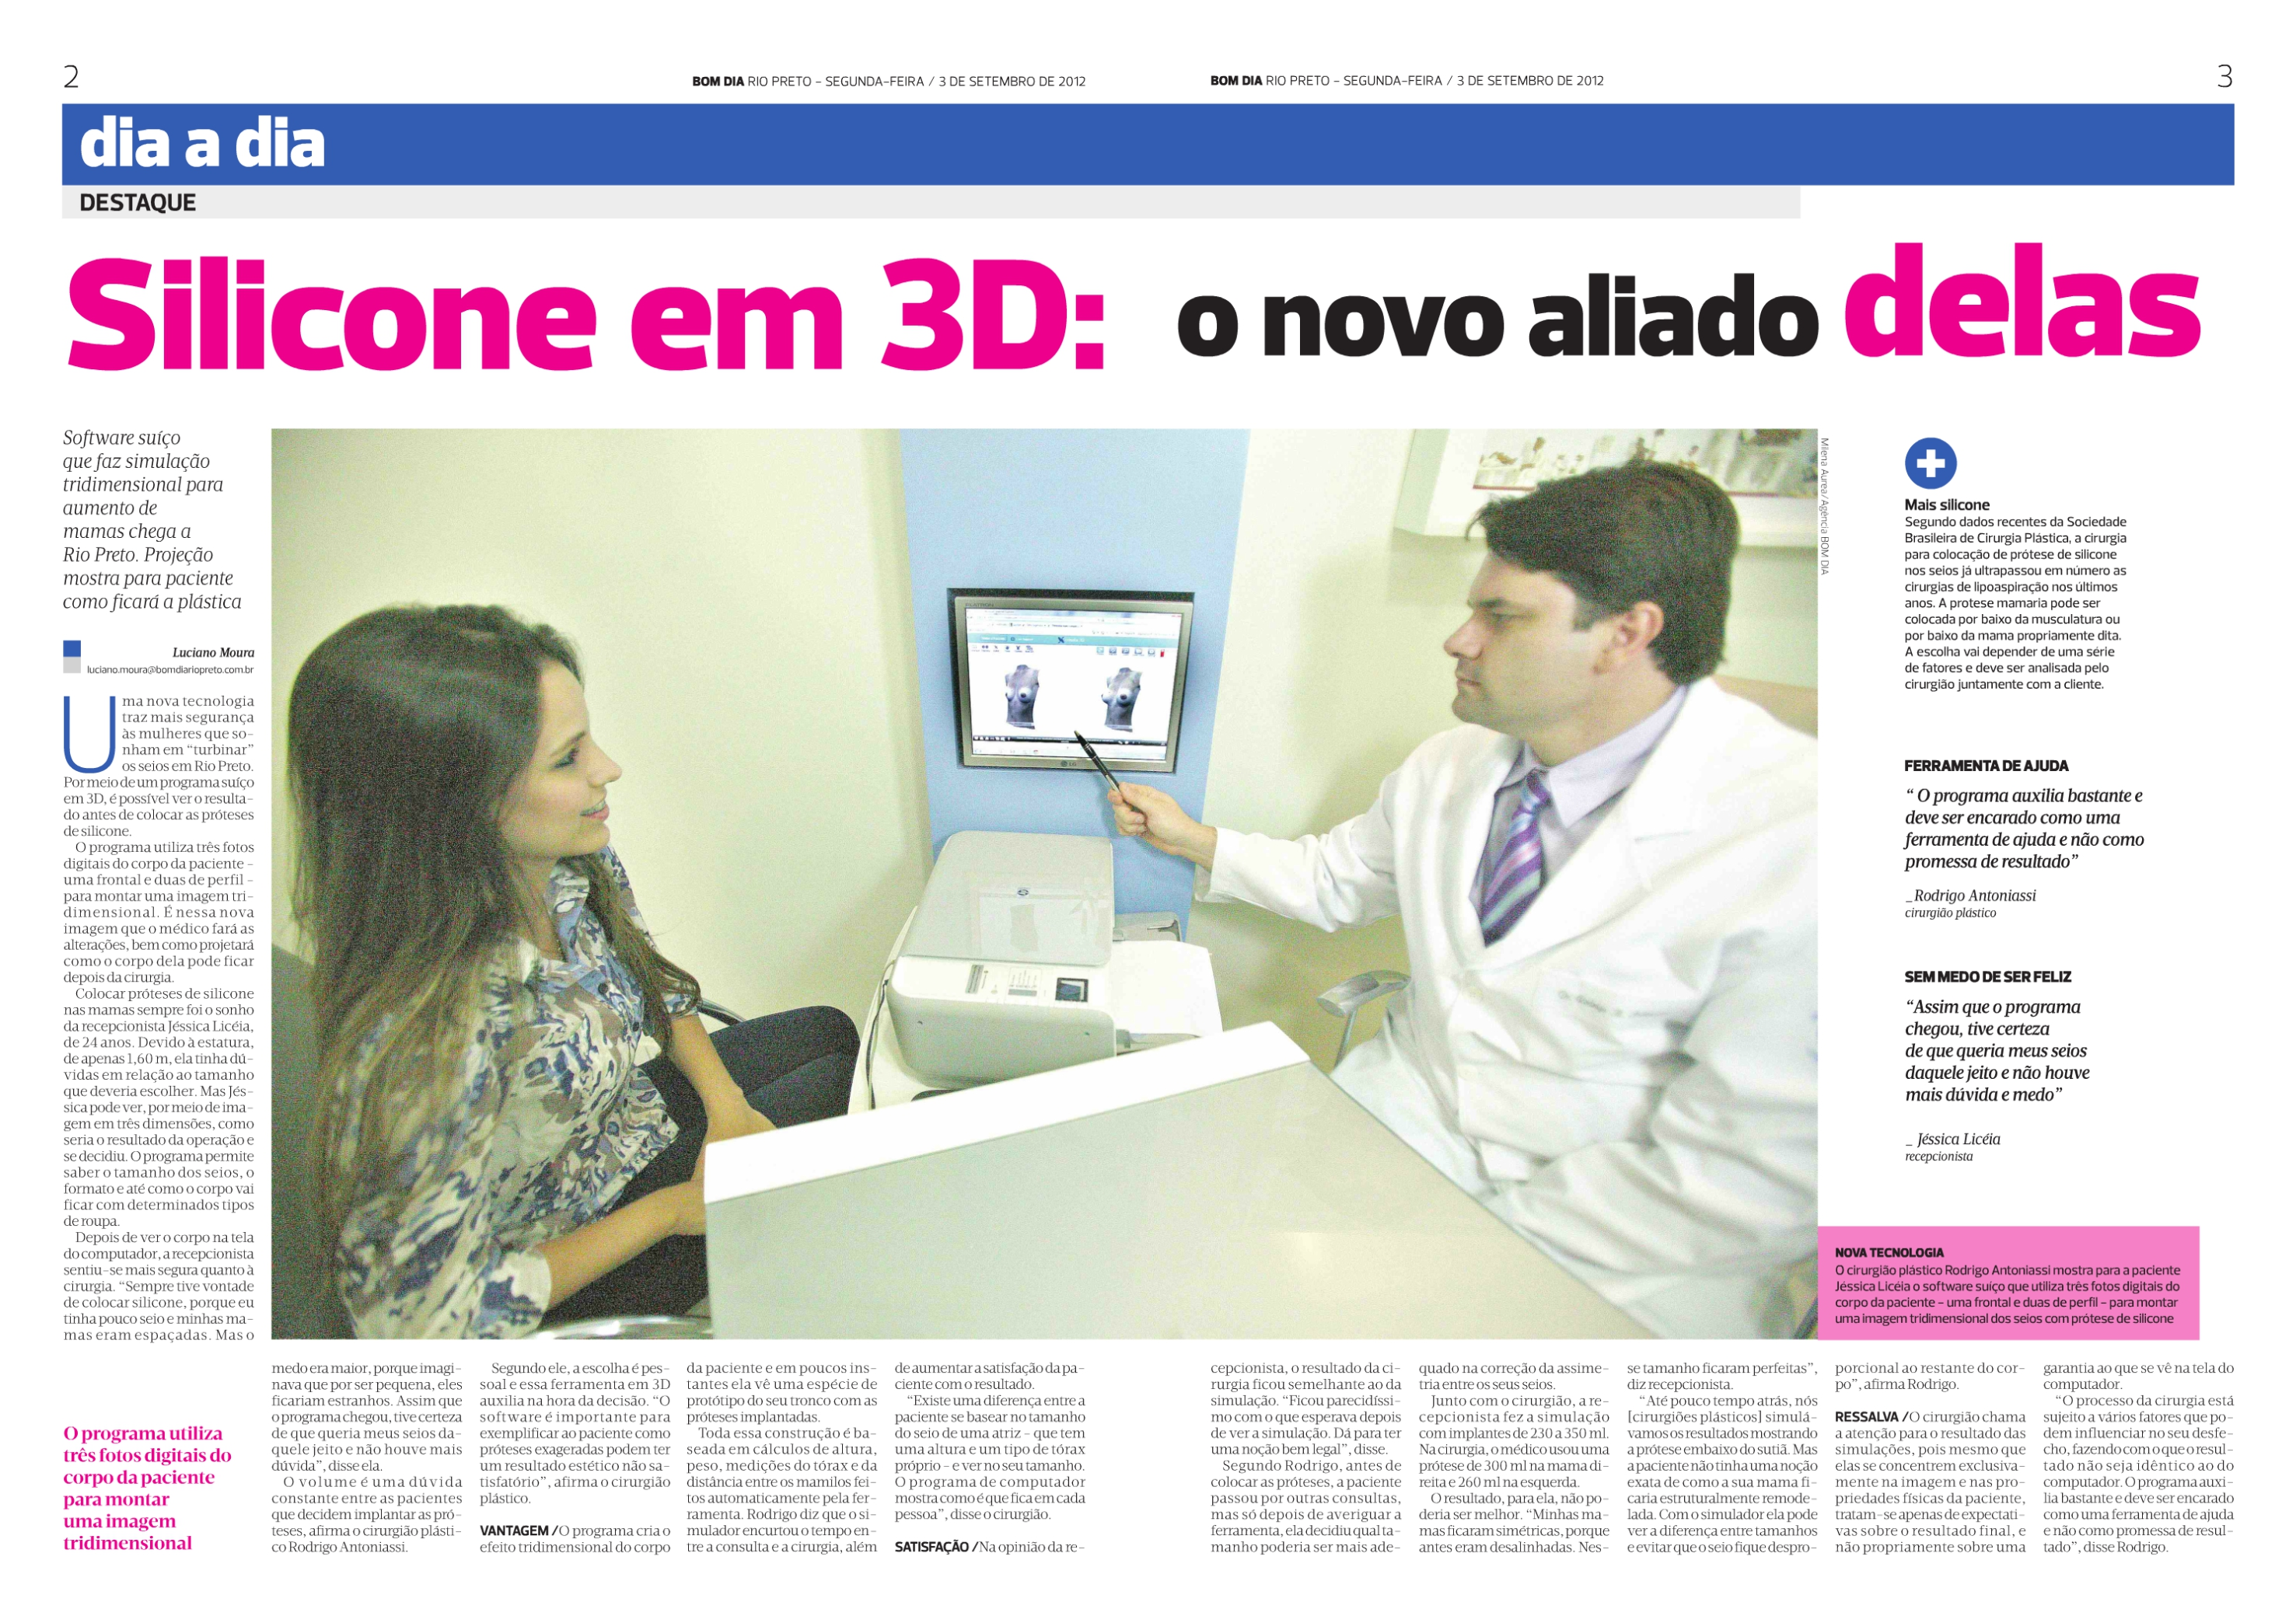 Jornal Bom Dia - Setembro 2012